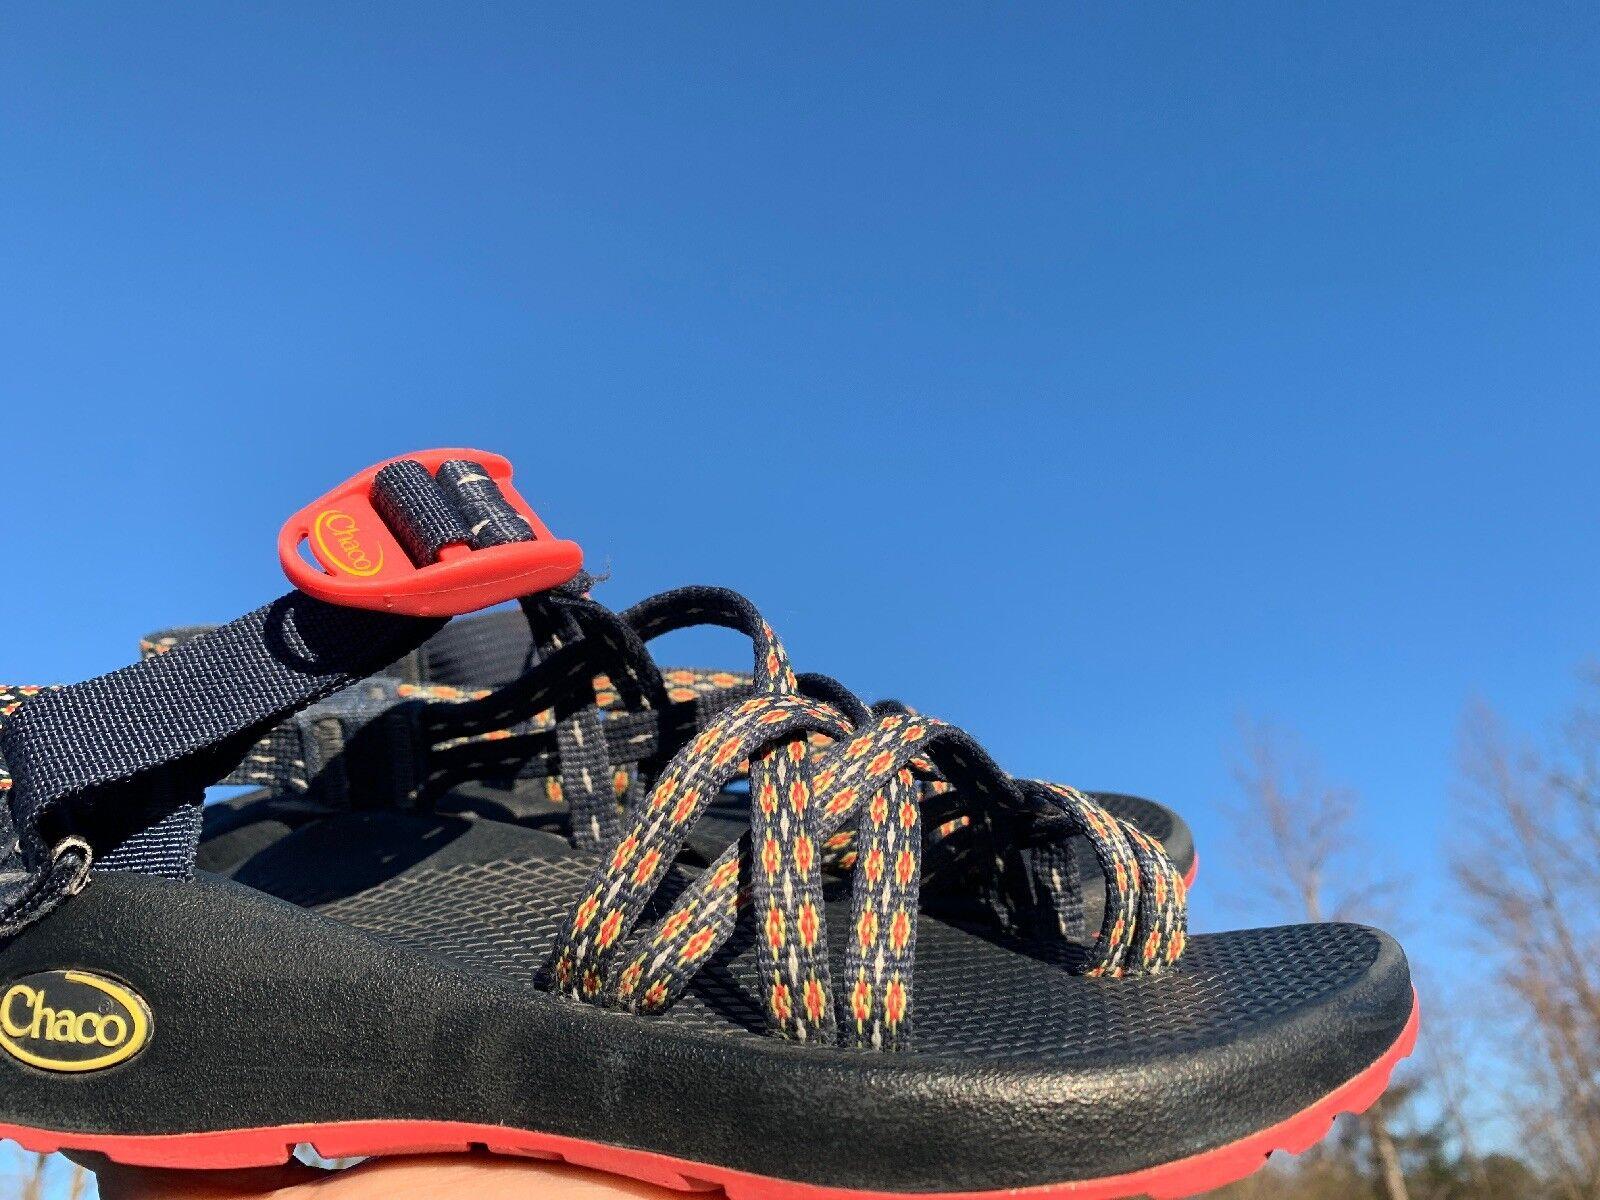 CHACO ZX 1 Classic Sport Criss Cross Straps Clog Clog Clog Sandals donna scarpe Sz 6 b10 b32943